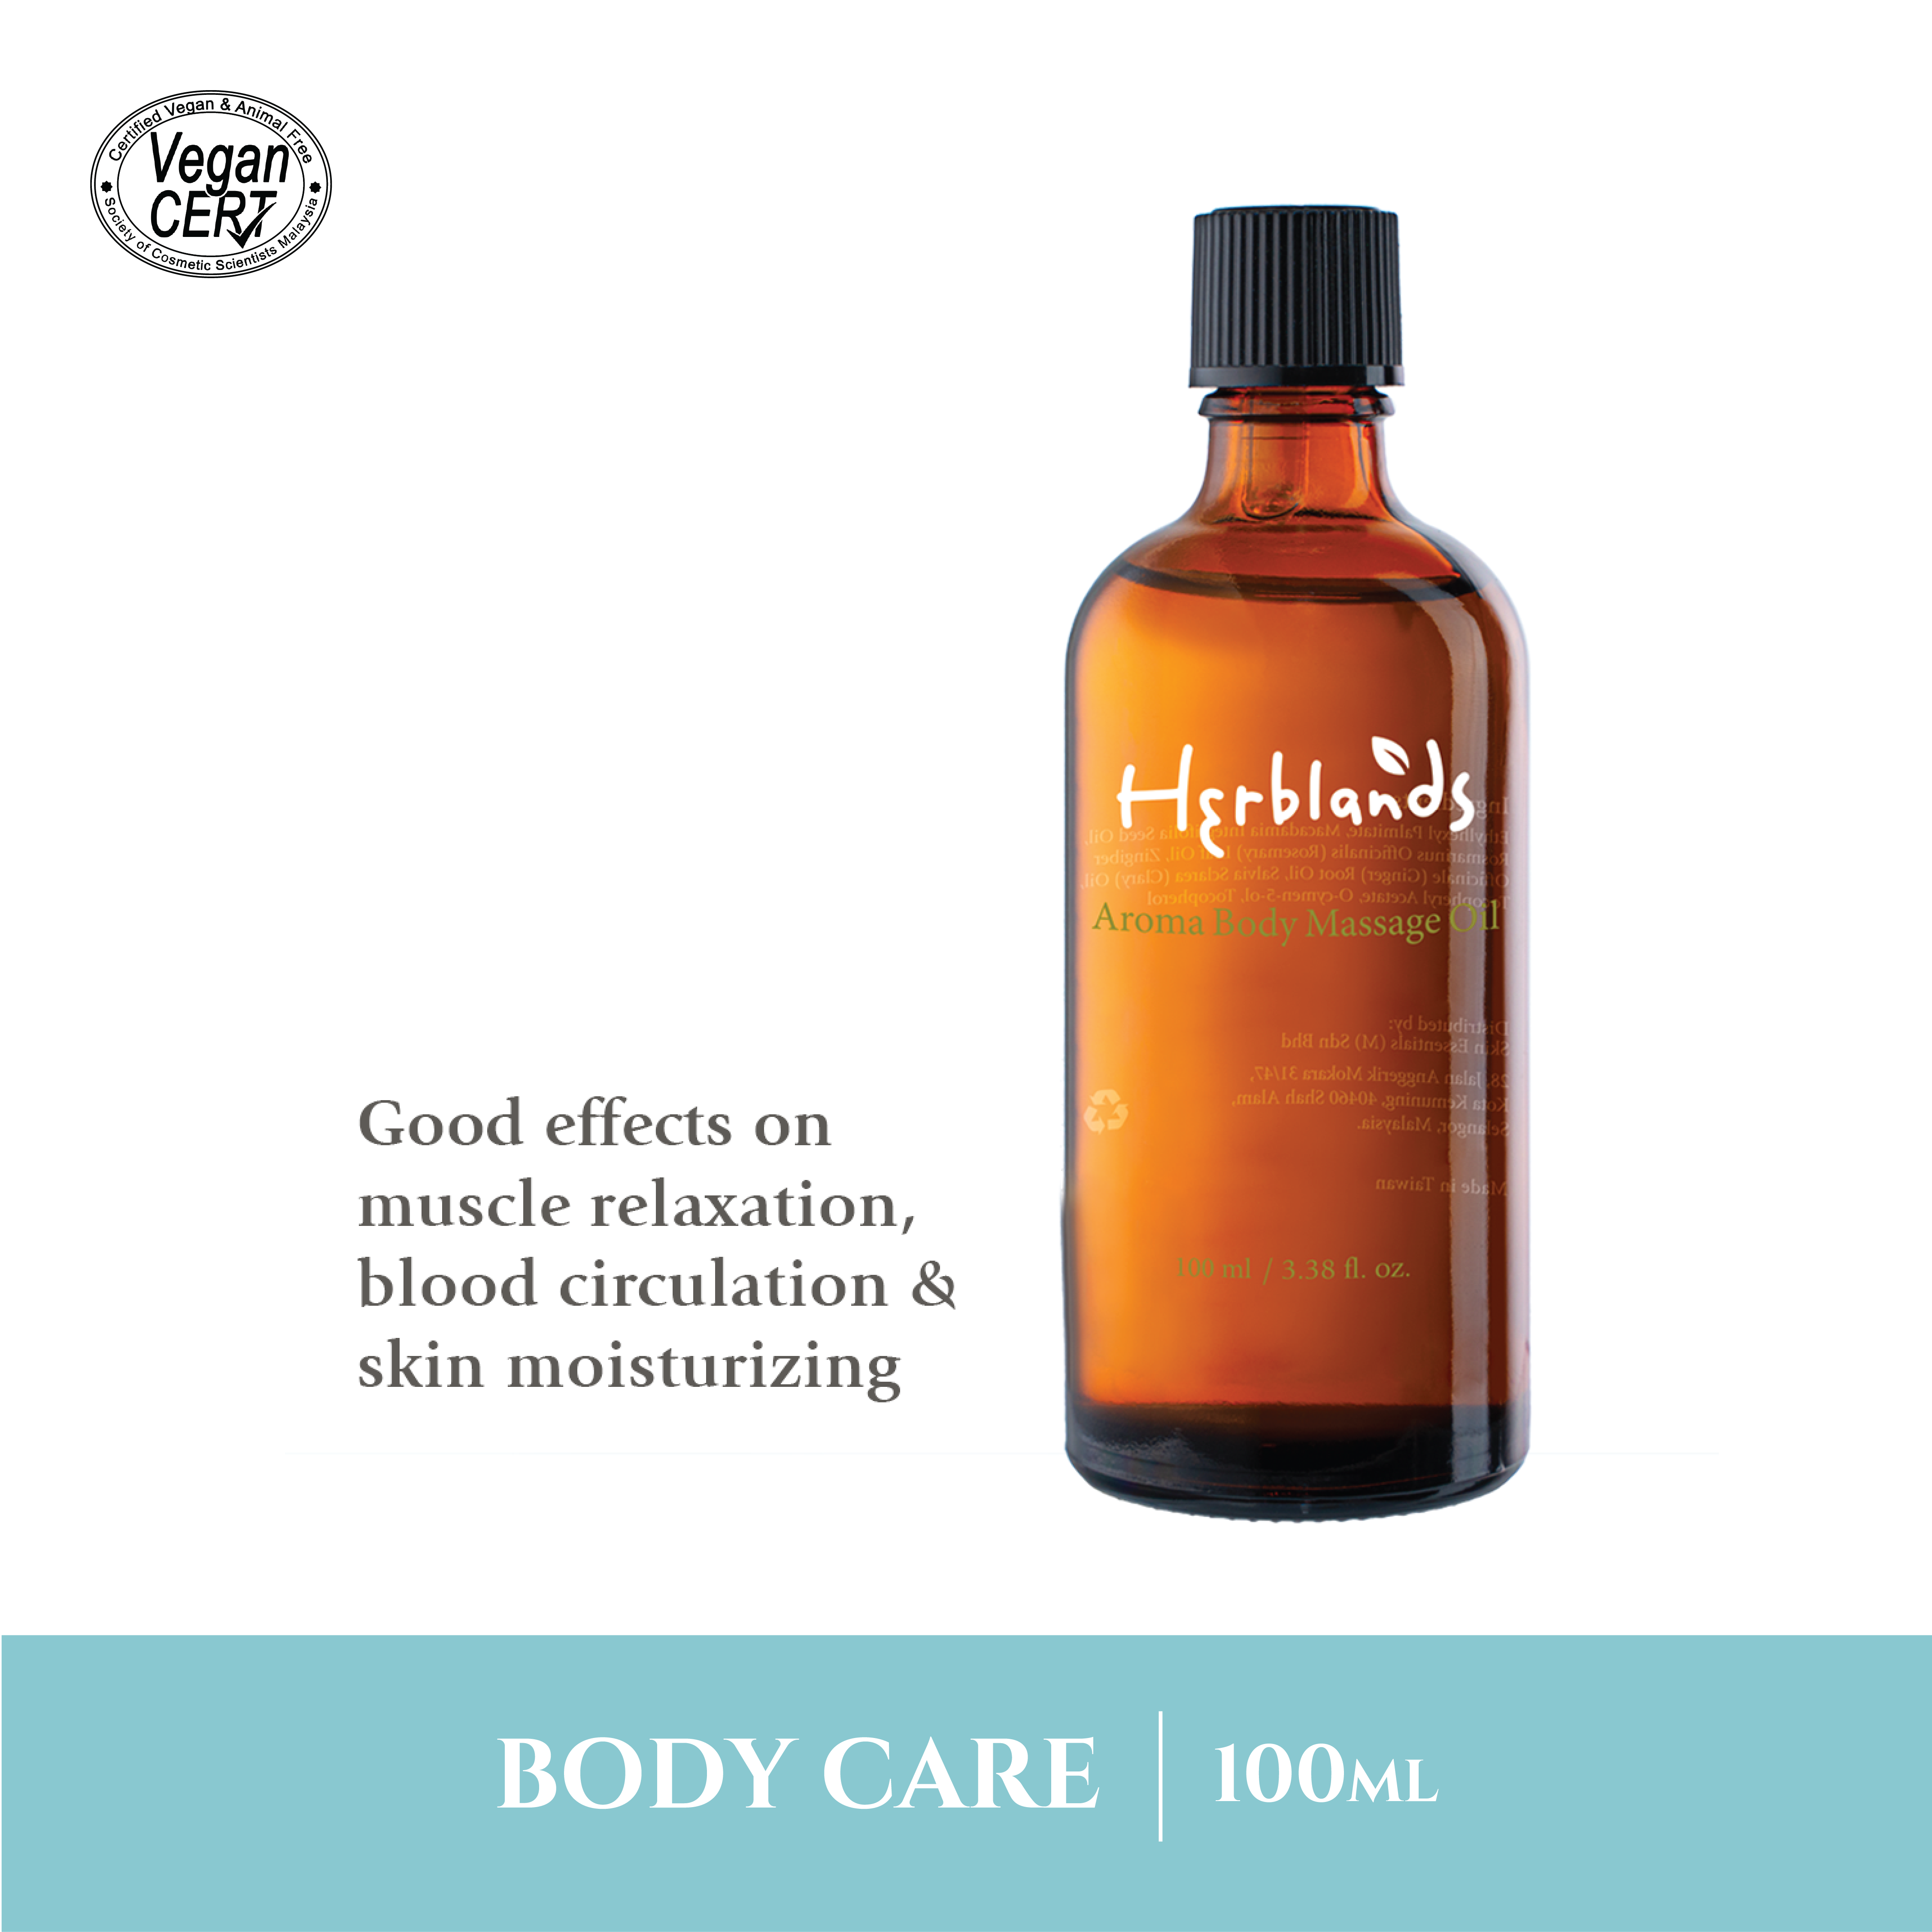 Herblands Aroma Body Massage Oil